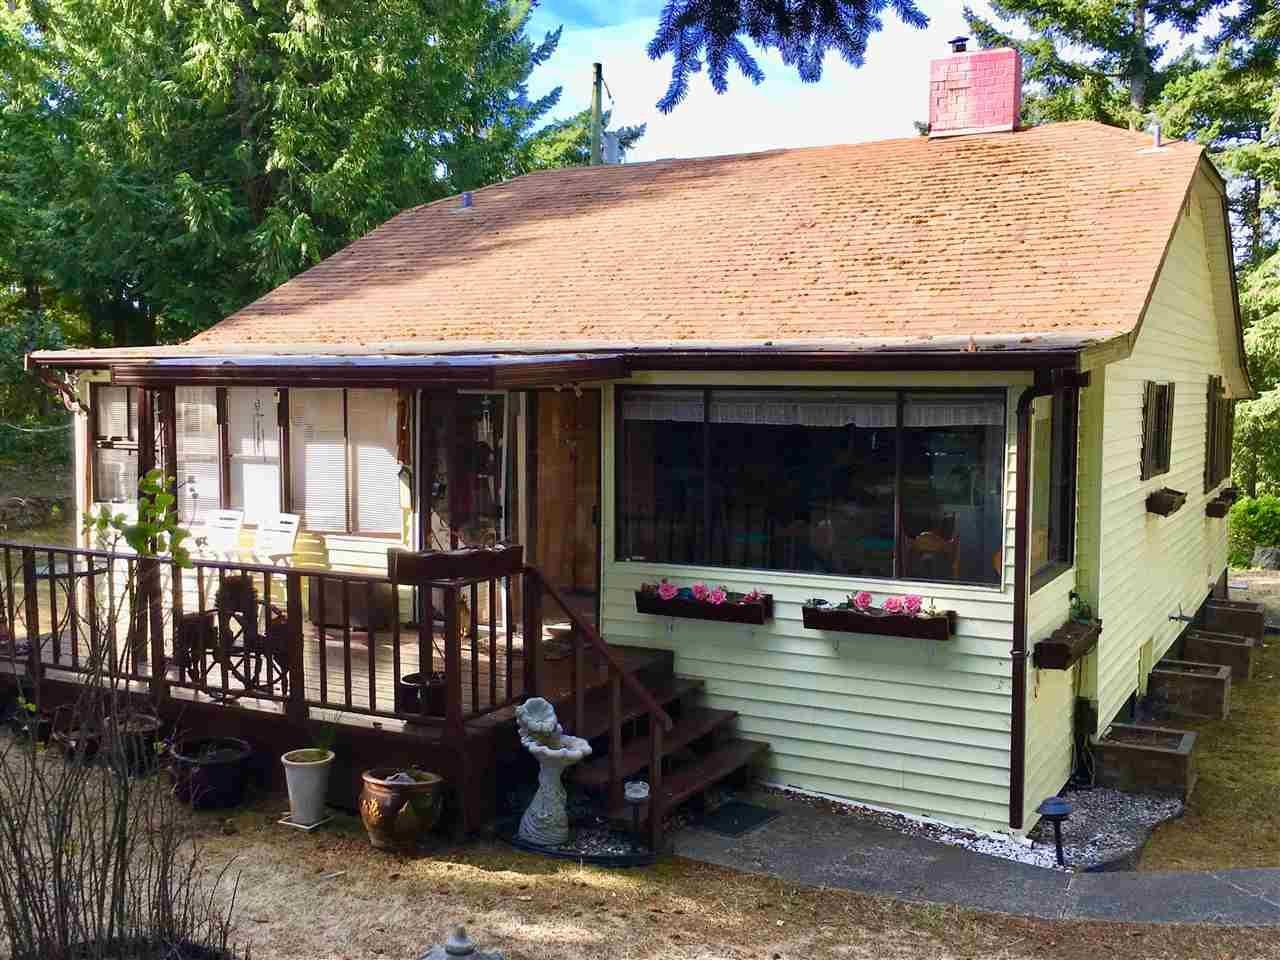 Main Photo: 370 CAMPBELL BAY Road: Mayne Island House for sale (Islands-Van. & Gulf)  : MLS®# R2464160